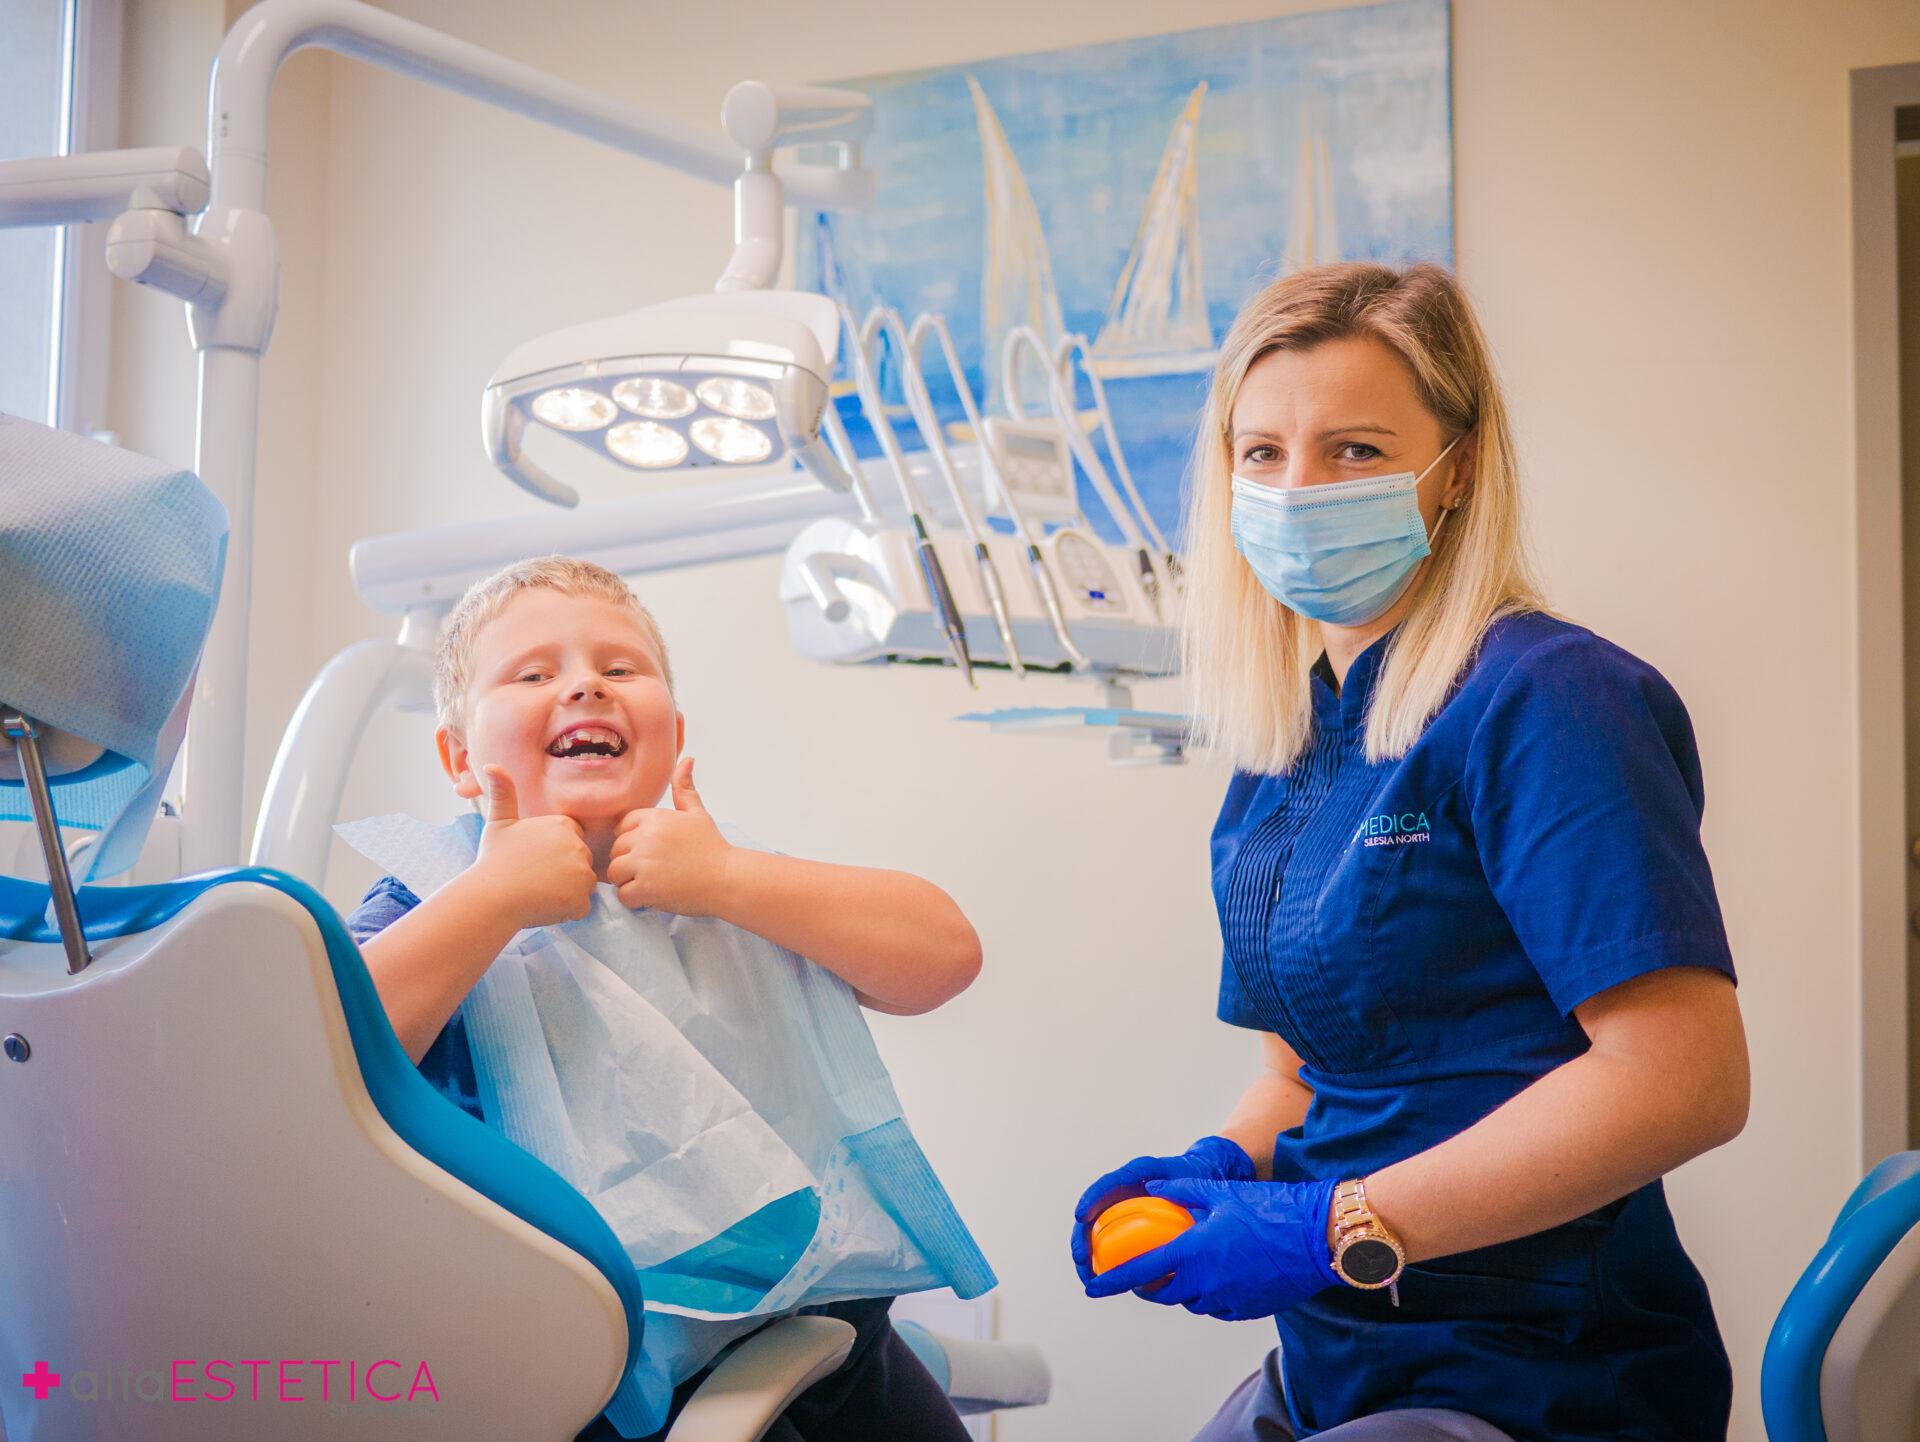 ortodoncja AlfaEstetica